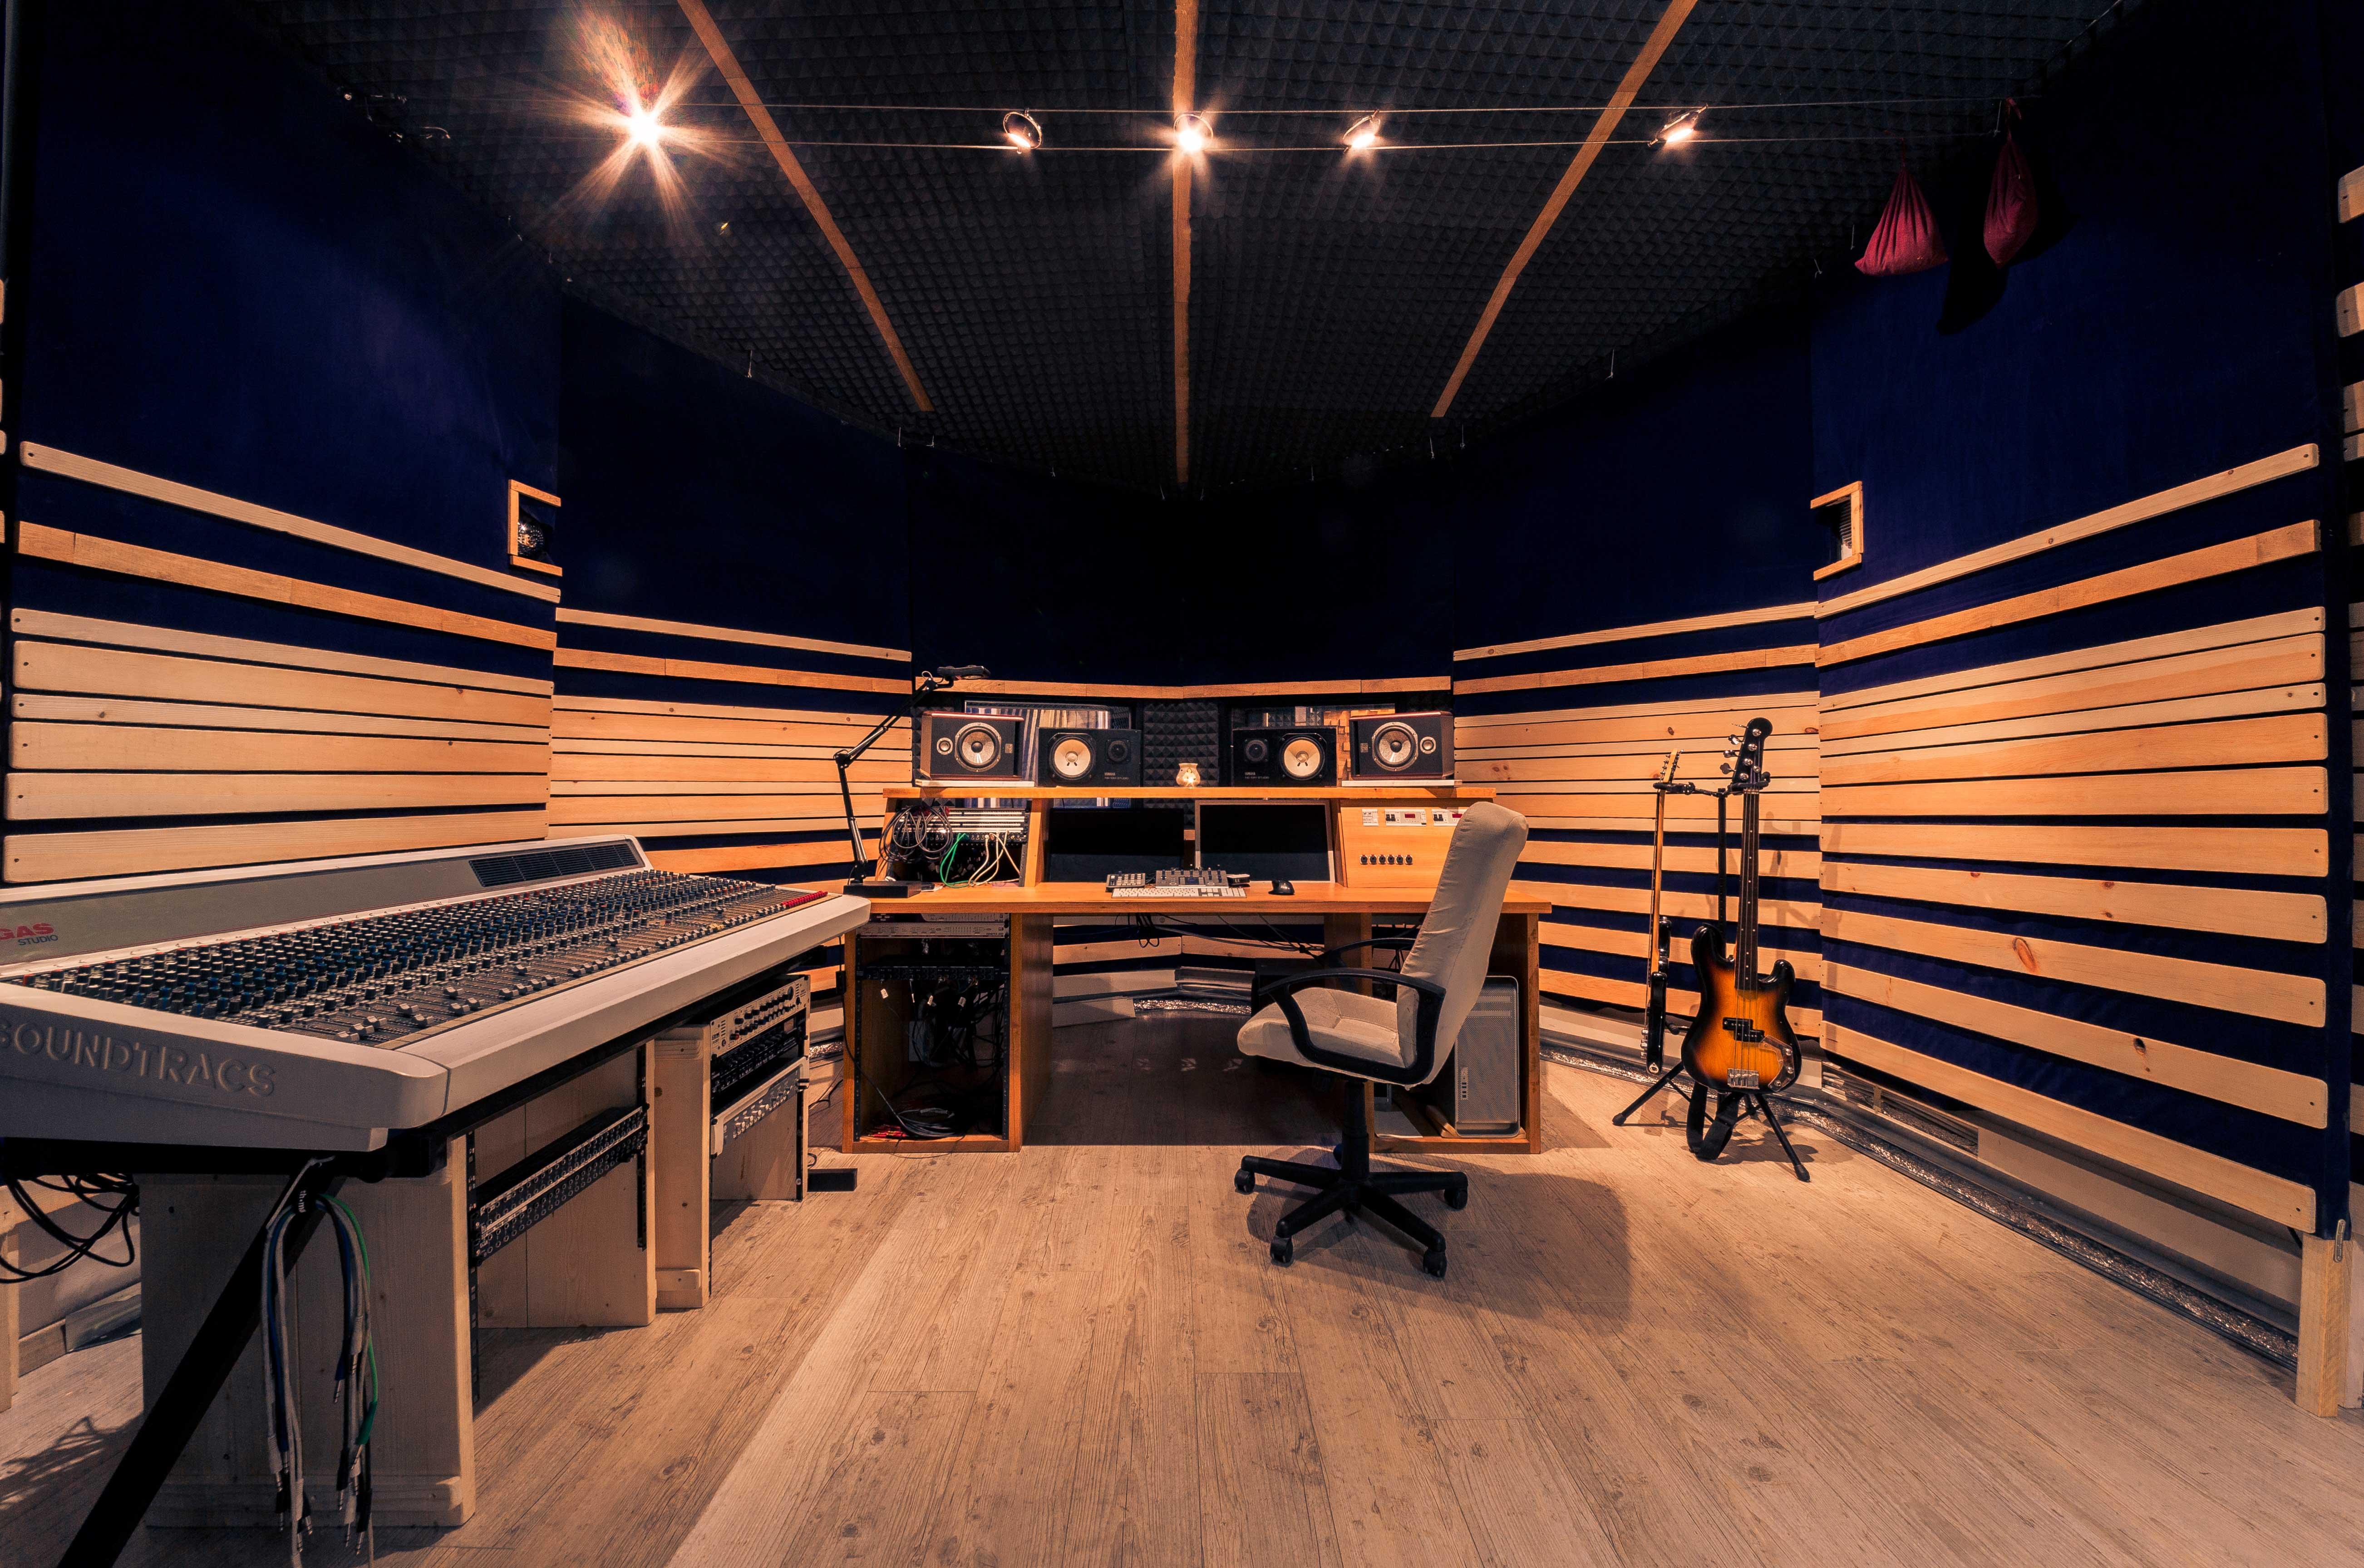 Studio registrazione - sala regia